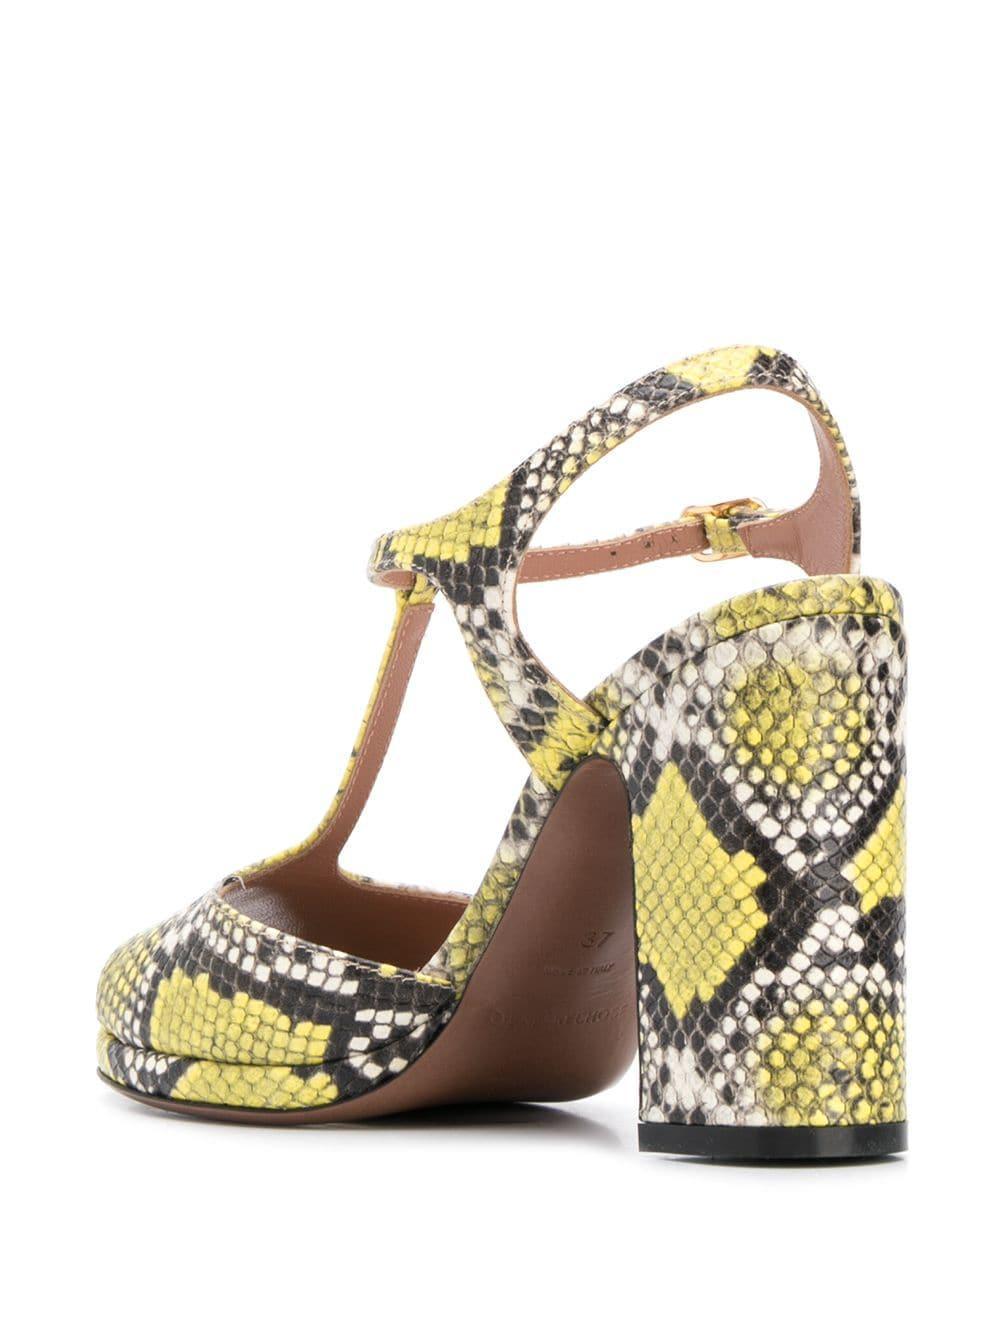 12cd83d882d L'Autre Chose Snakeskin Print Sandals in Yellow - Lyst